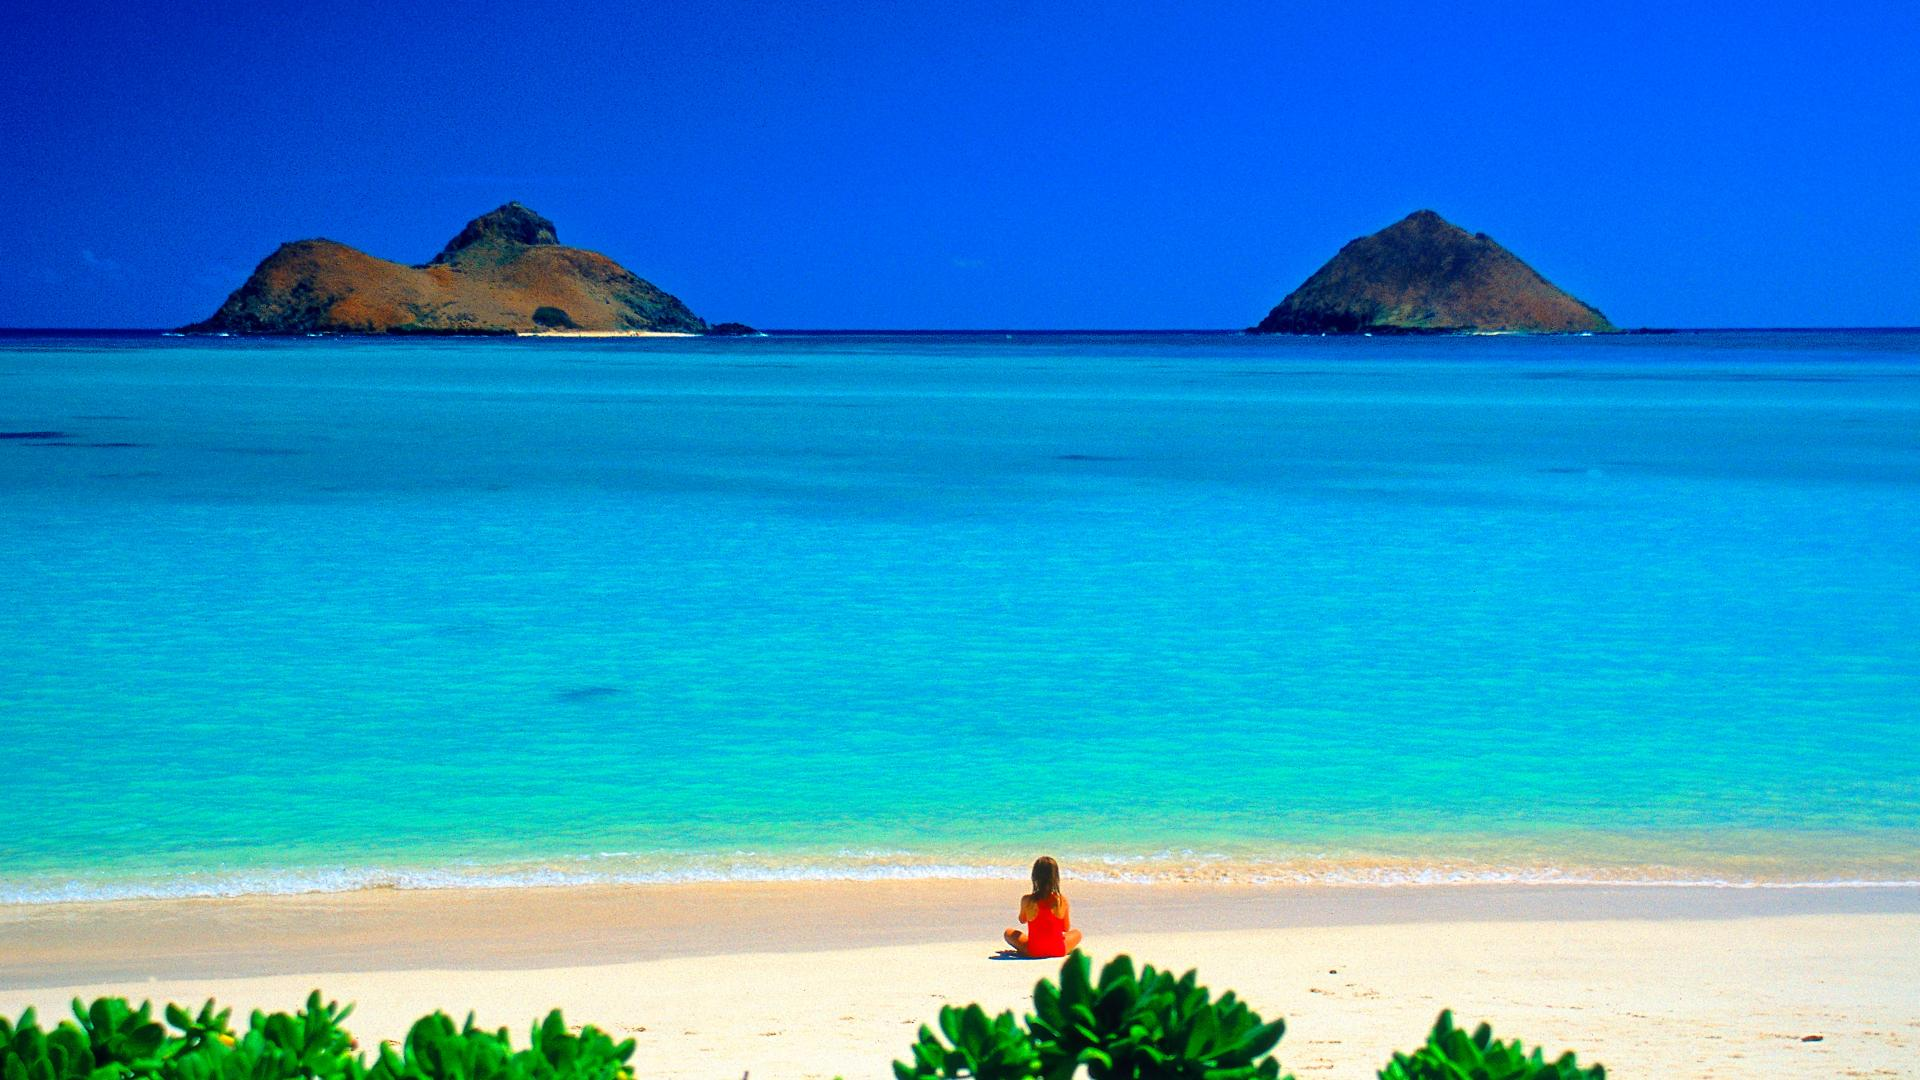 Beach Desktop Backgrounds and Wallpaper   Lanikai Beach Oahu Hawaii 1920x1080